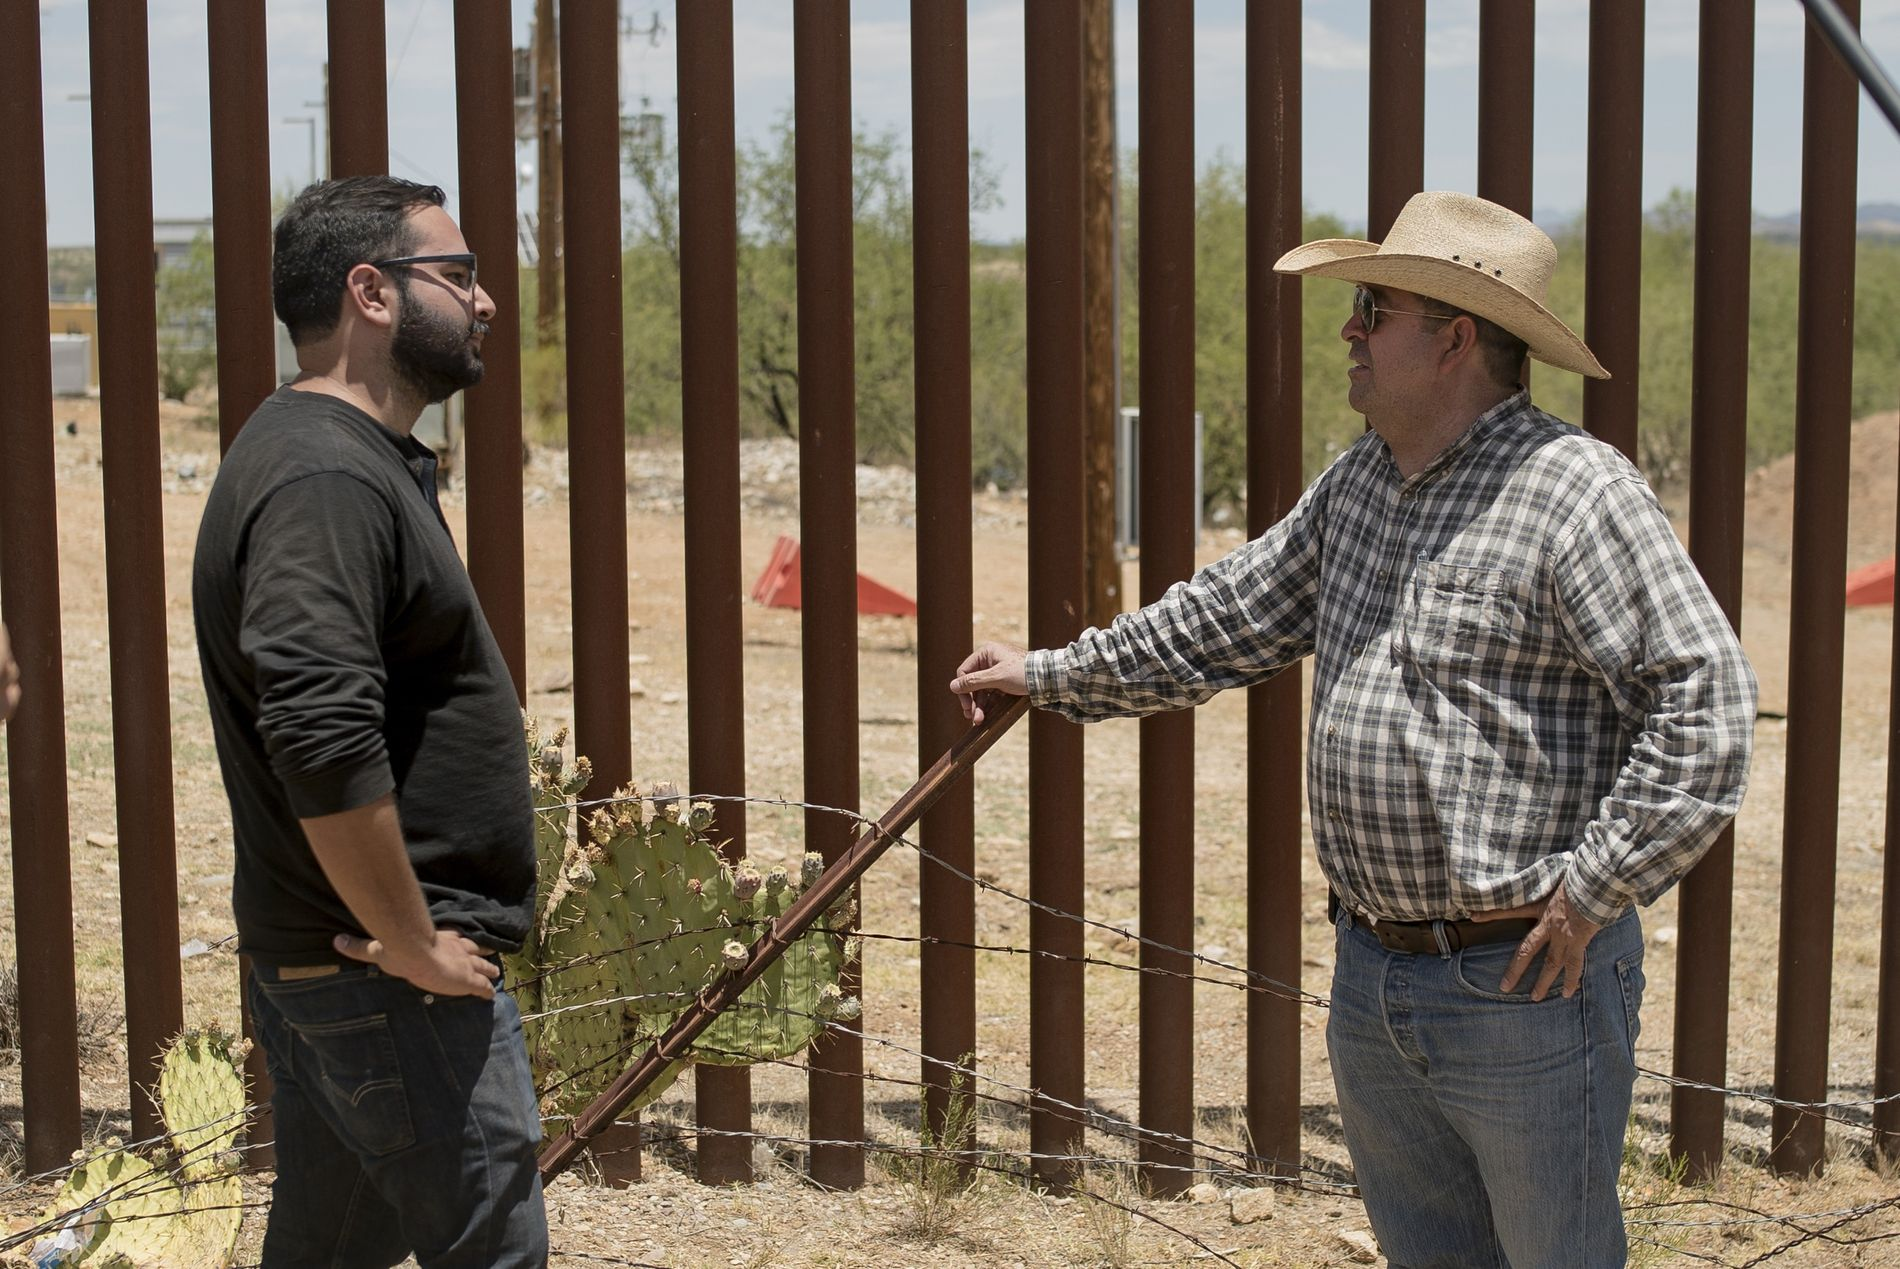 Explorer Investigation: El Gran Muro